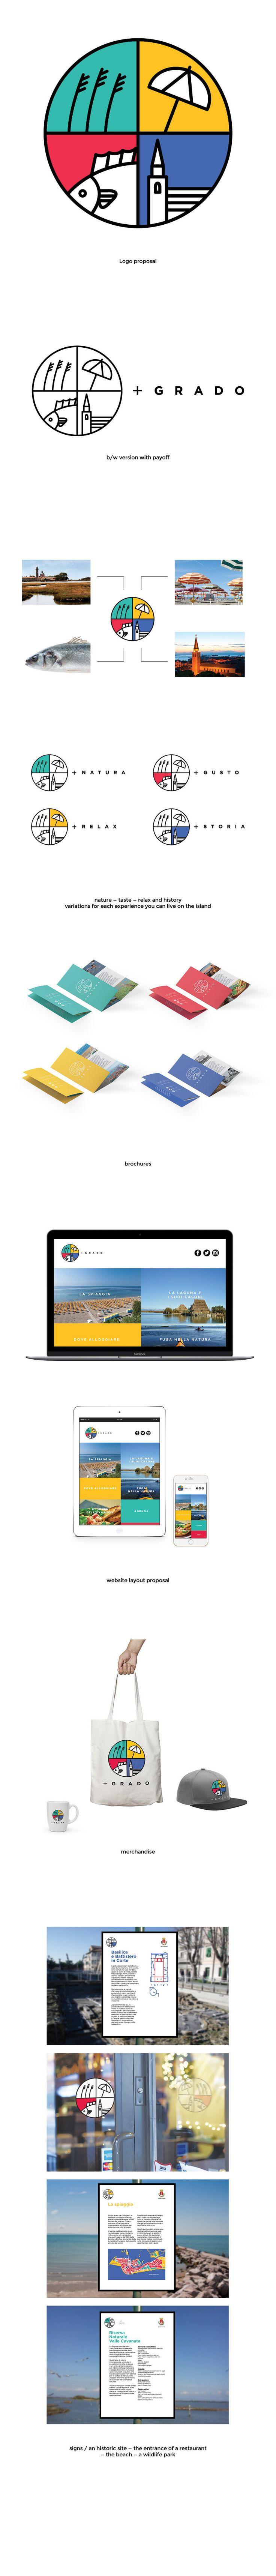 Vedi il mio progetto @Behance: \u201cGrado - rebranding\u201d https://www.behance.net/gallery/52543119/Grado-rebranding